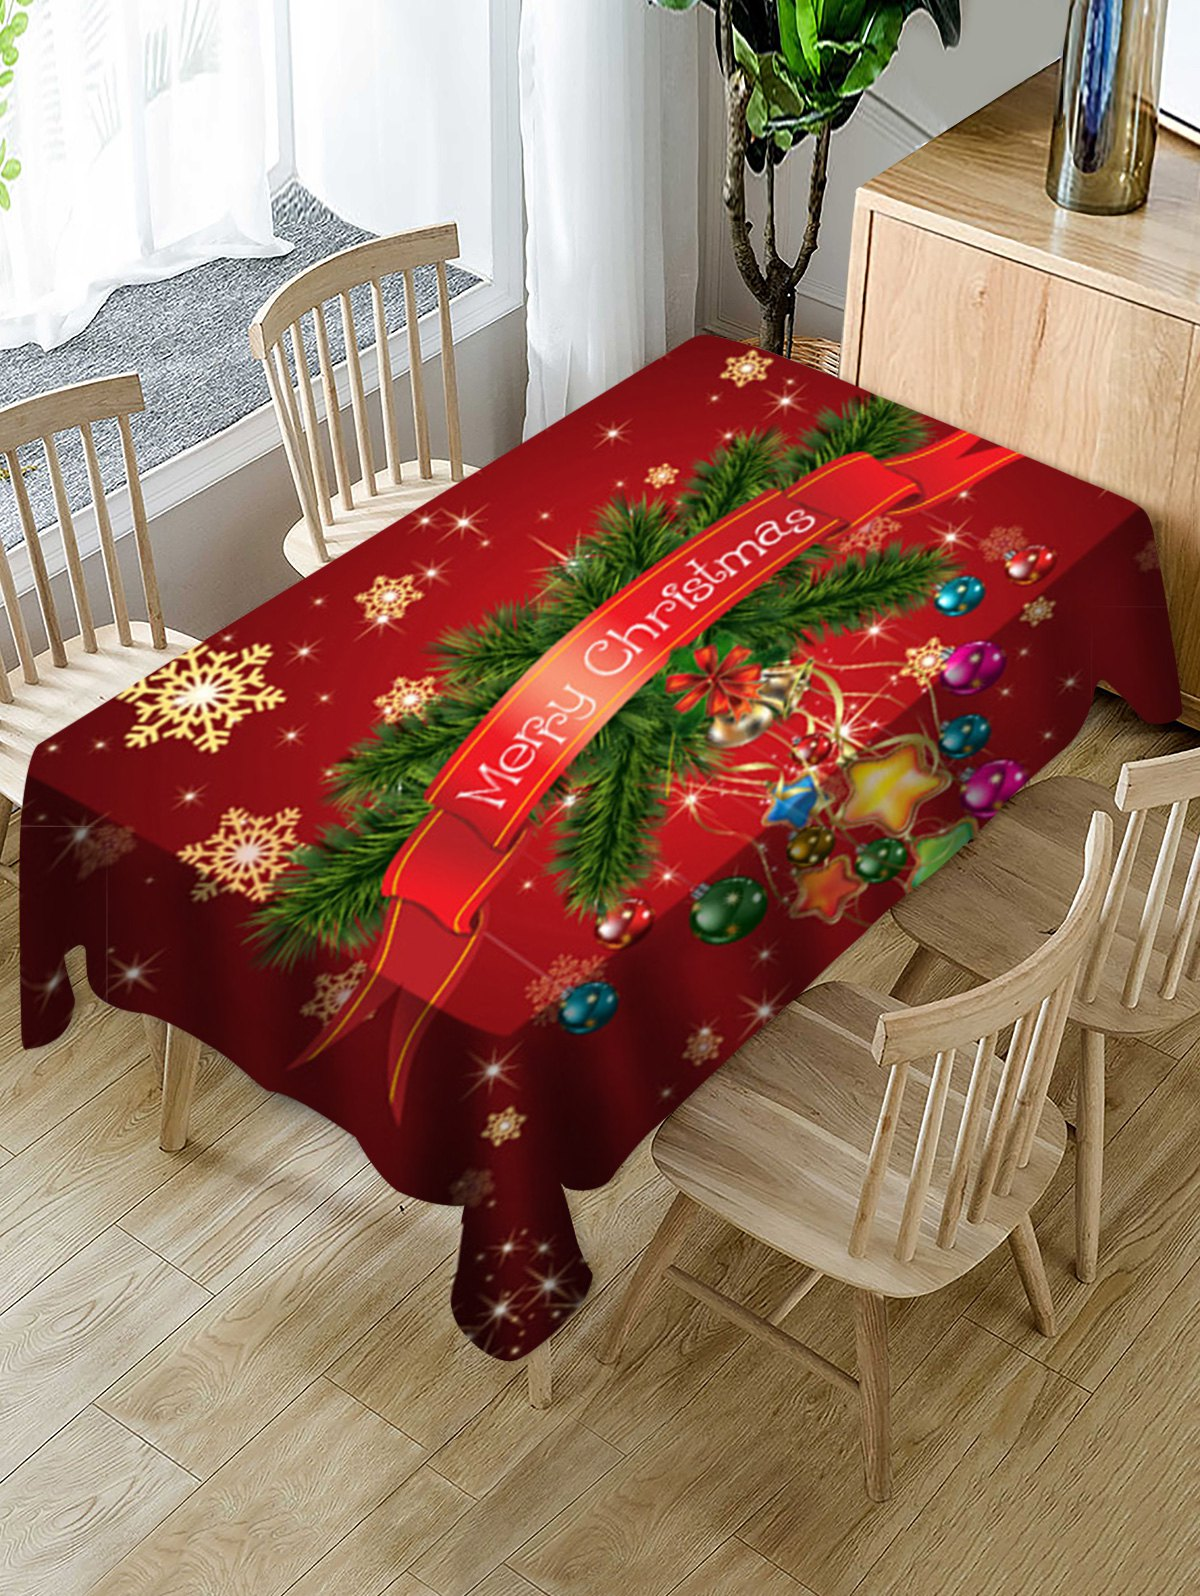 Merry Christmas Snowflake Print Fabric Waterproof Tablecloth